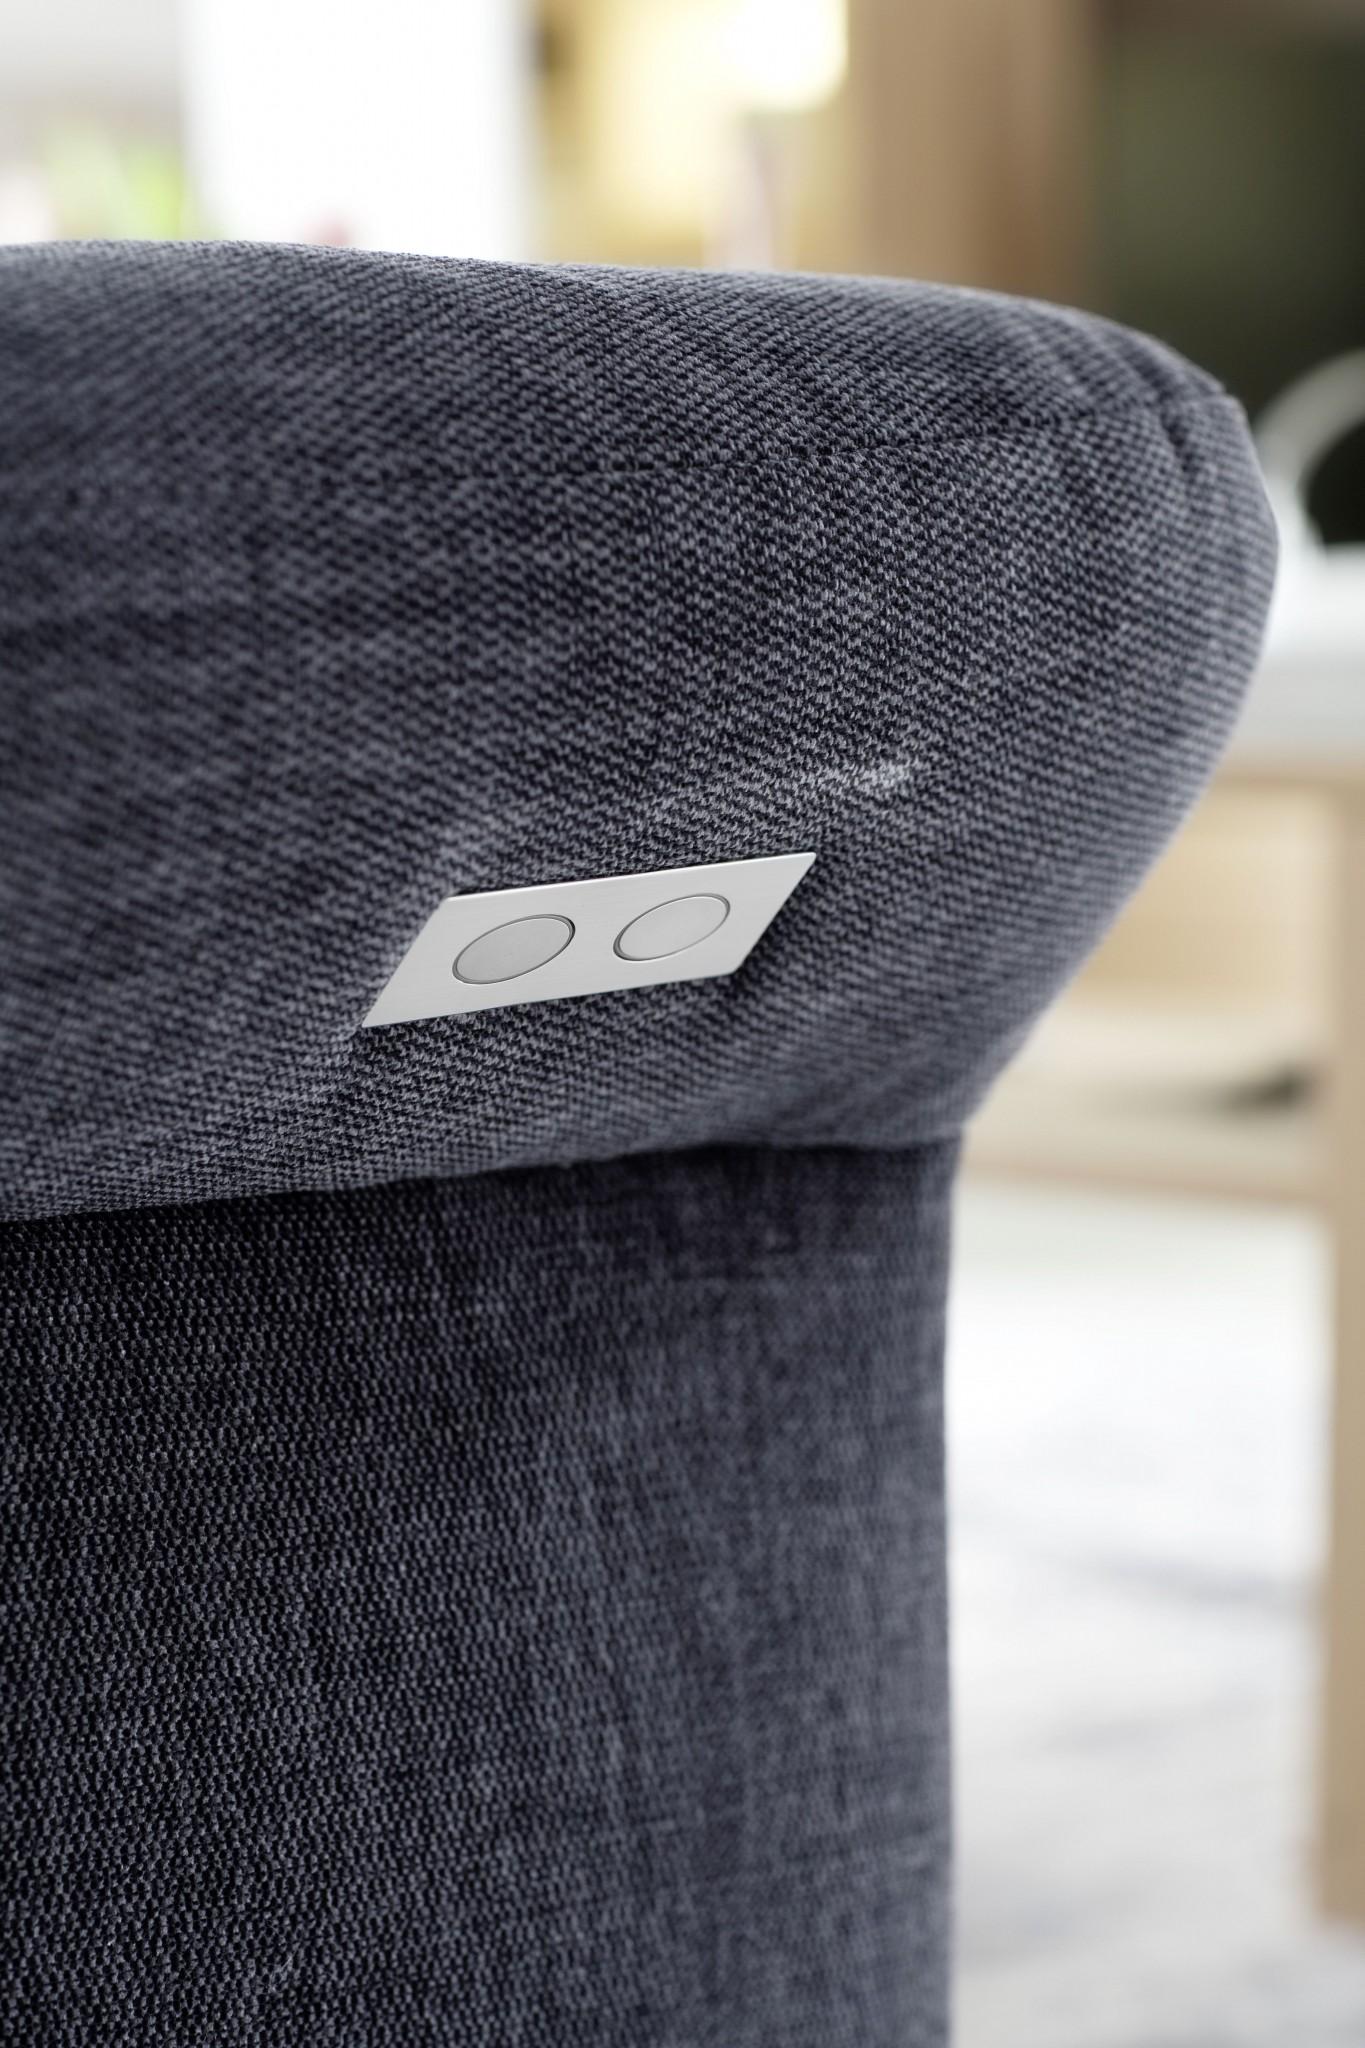 hochlehner relax polstergruppe topline 1572 in weichem strapazierf higem bezug easy care 1. Black Bedroom Furniture Sets. Home Design Ideas